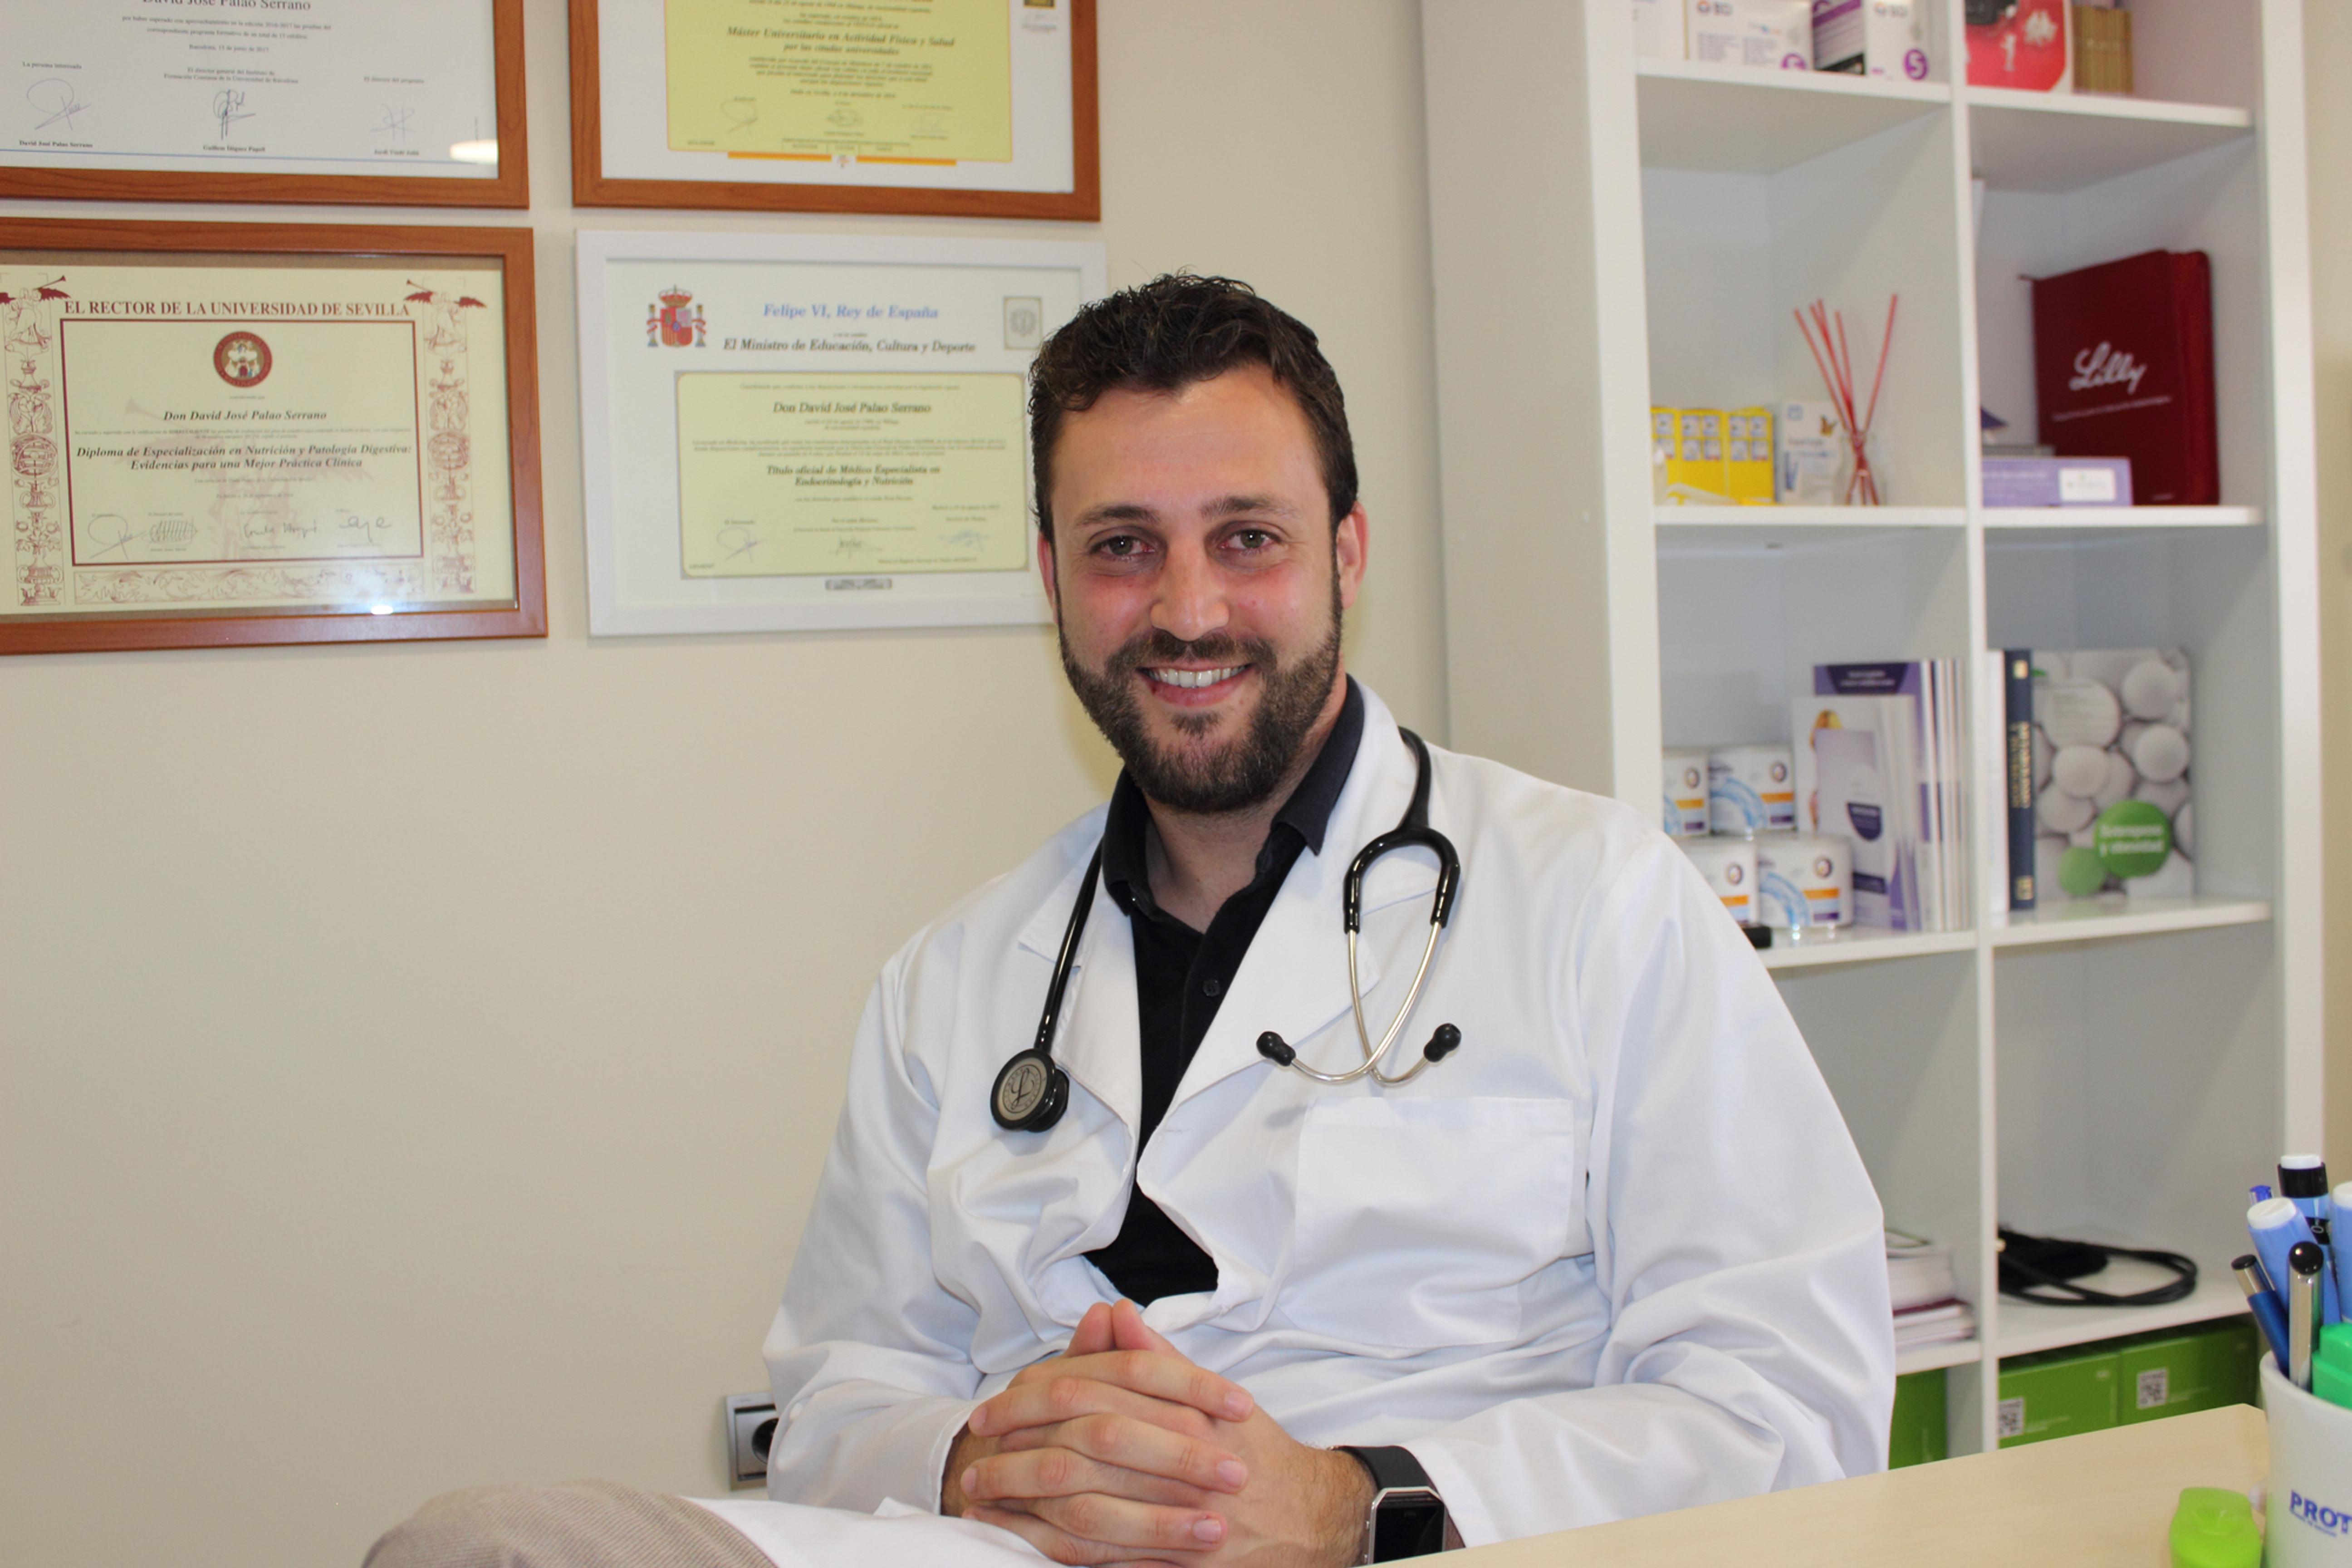 Dr Palao Endocrino Clínica Rusadir Melilla